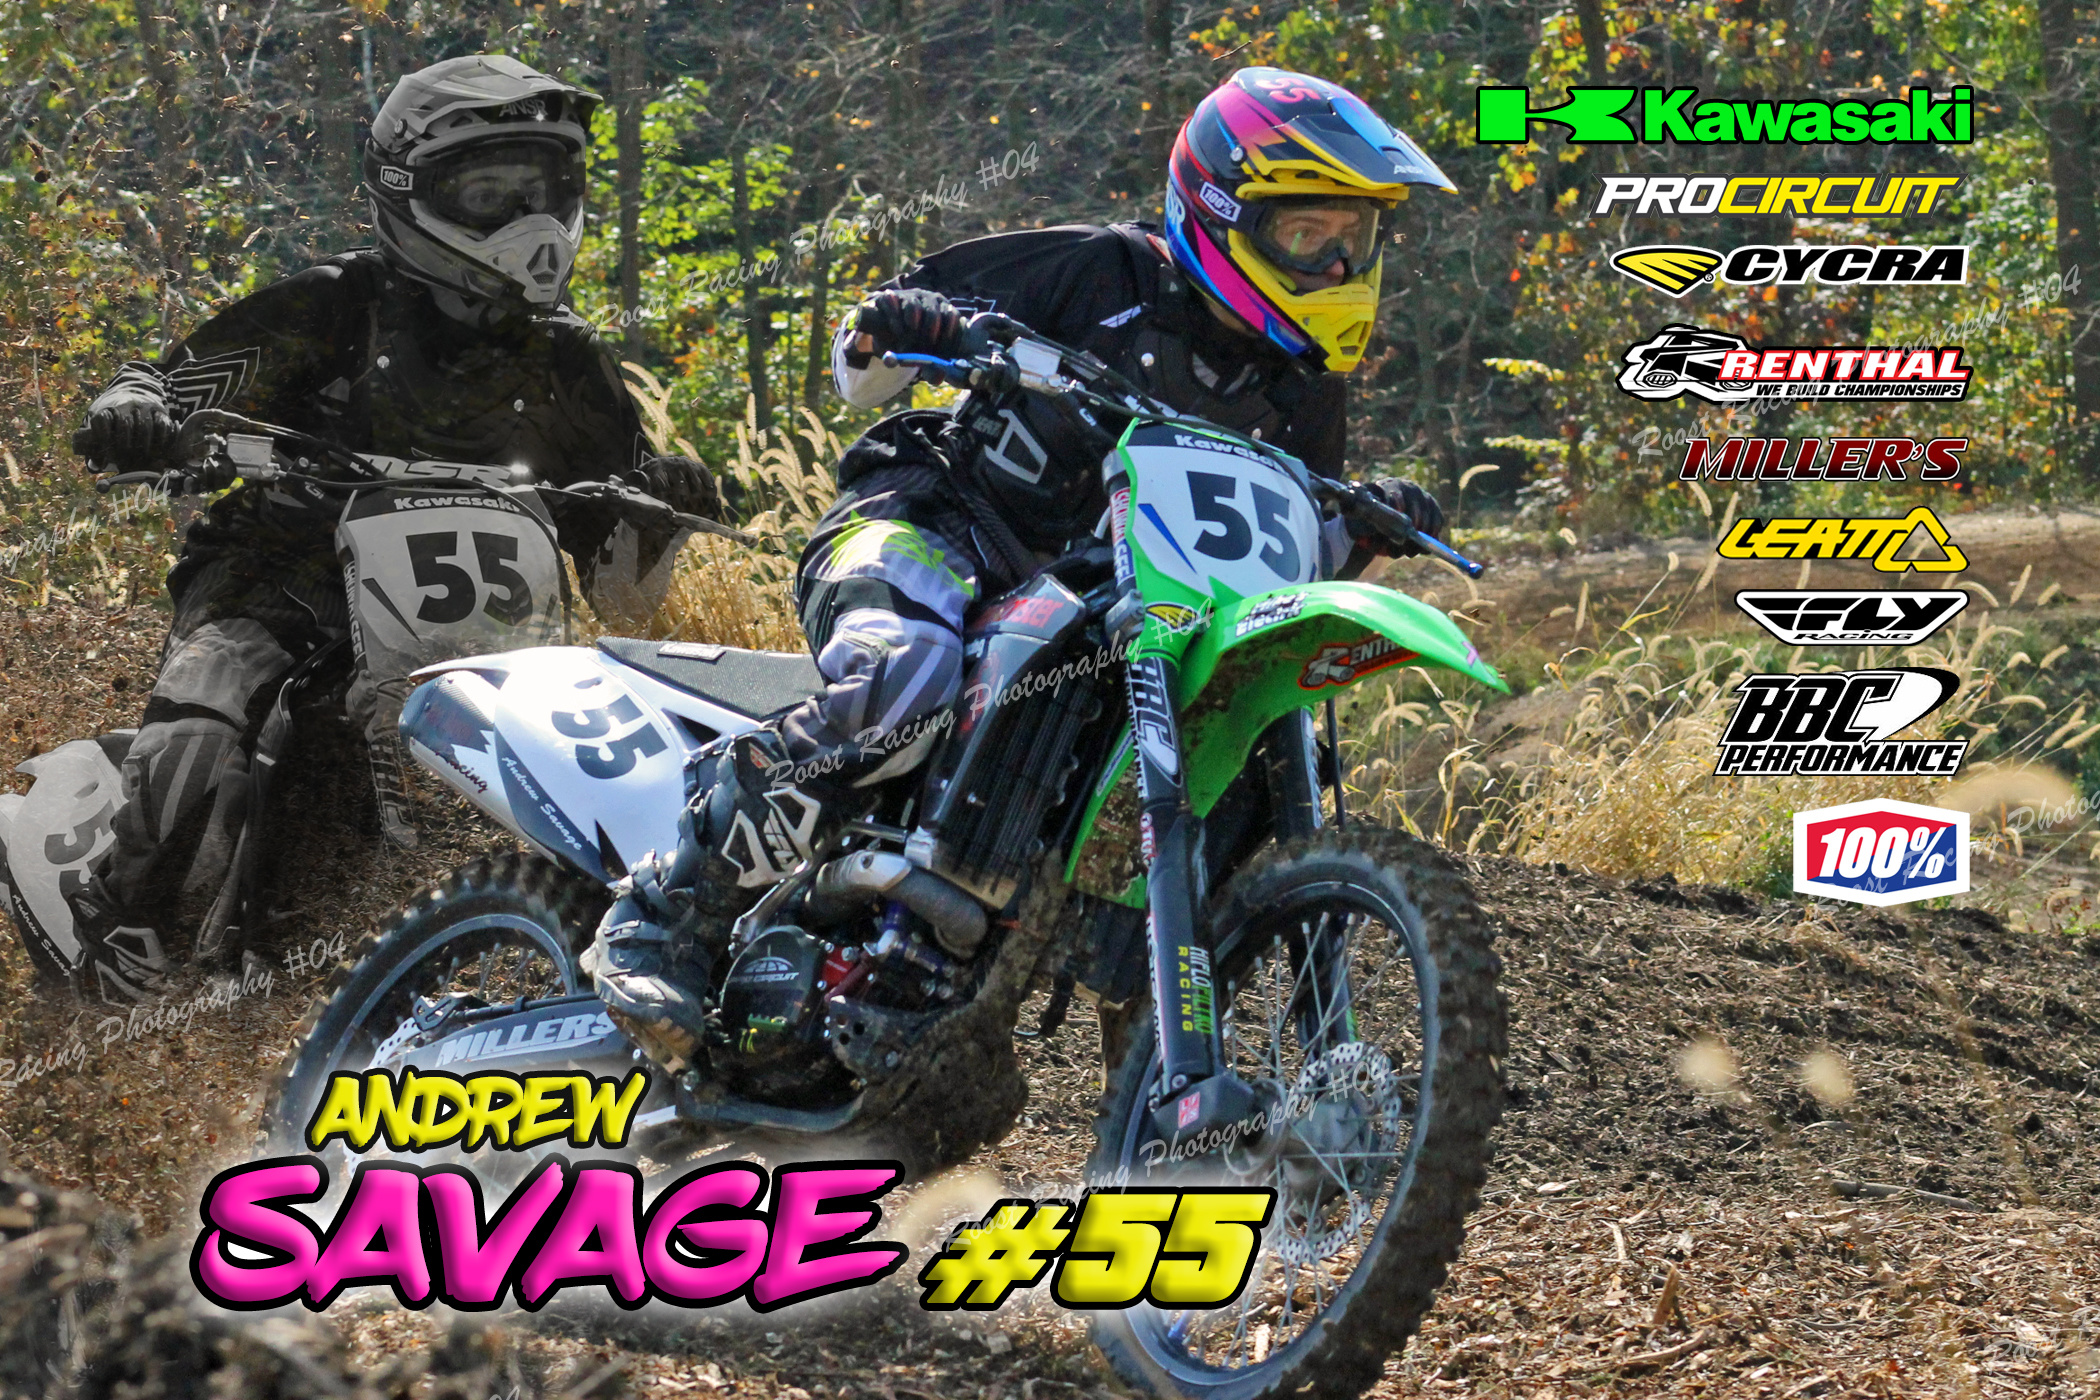 #55 Andrew Savage